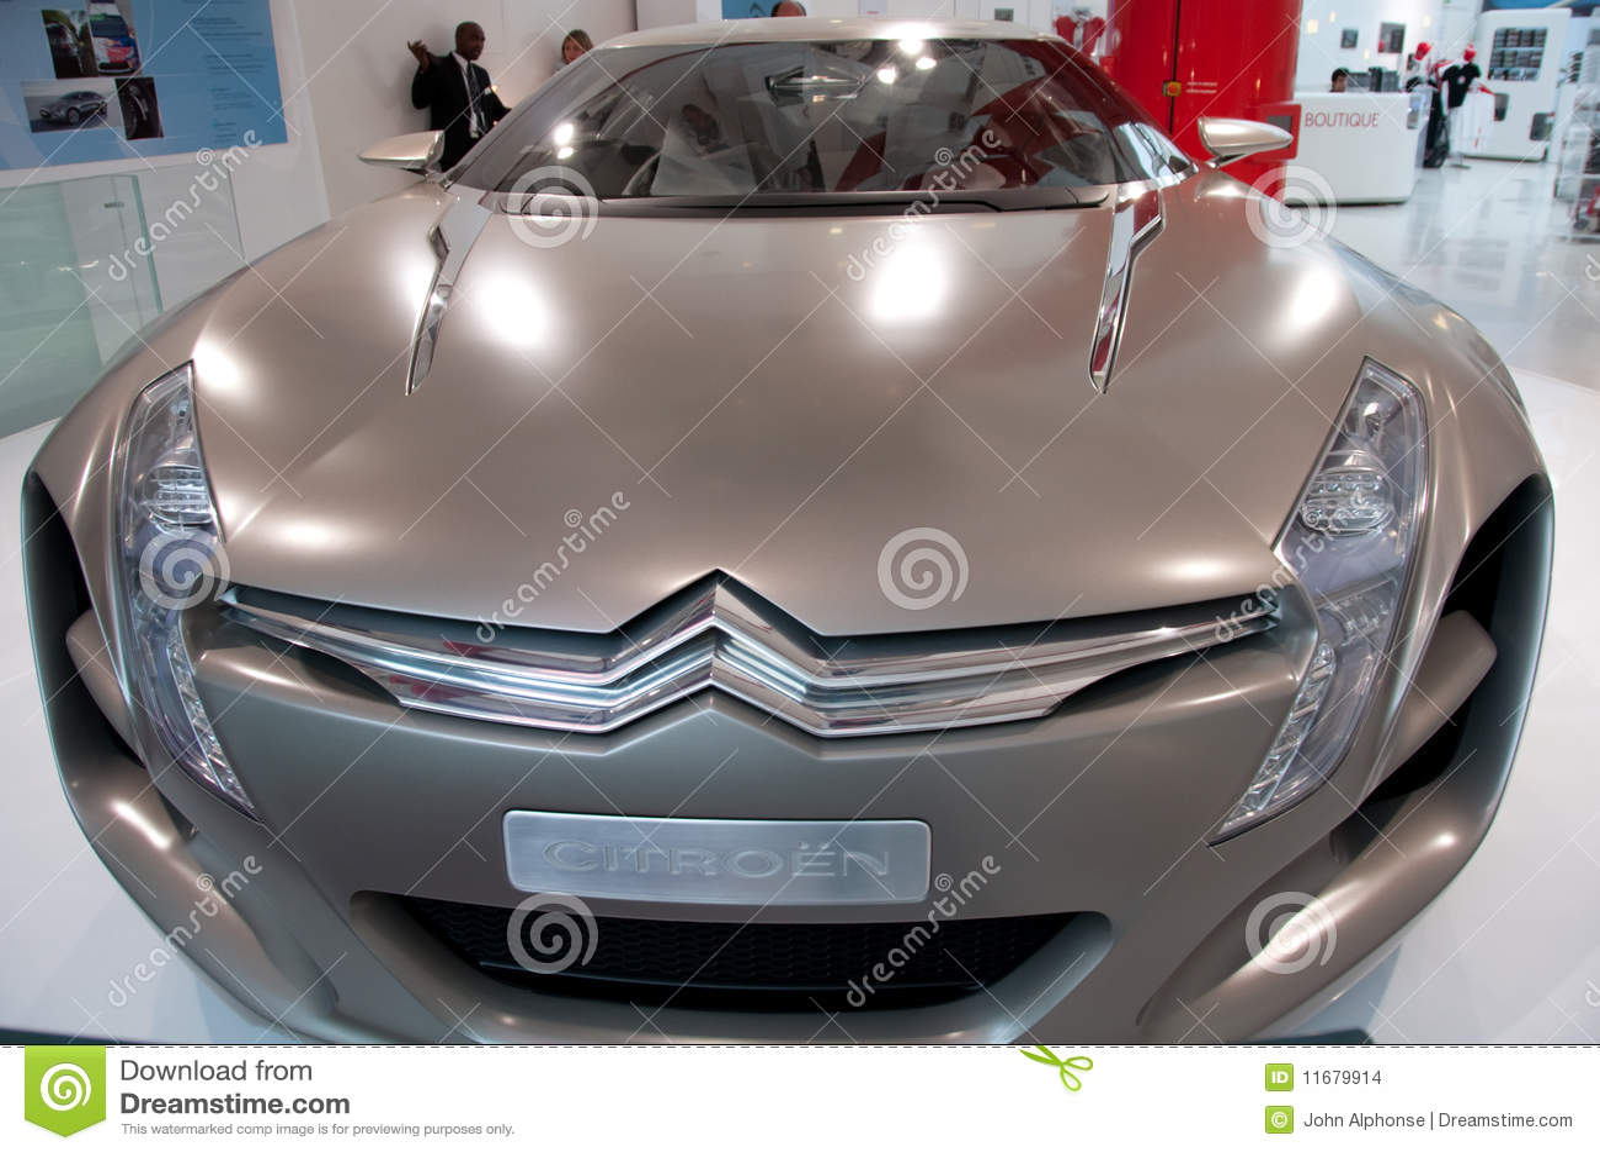 new car models citroen metisse paris showroom editorial photo 11679917. Black Bedroom Furniture Sets. Home Design Ideas